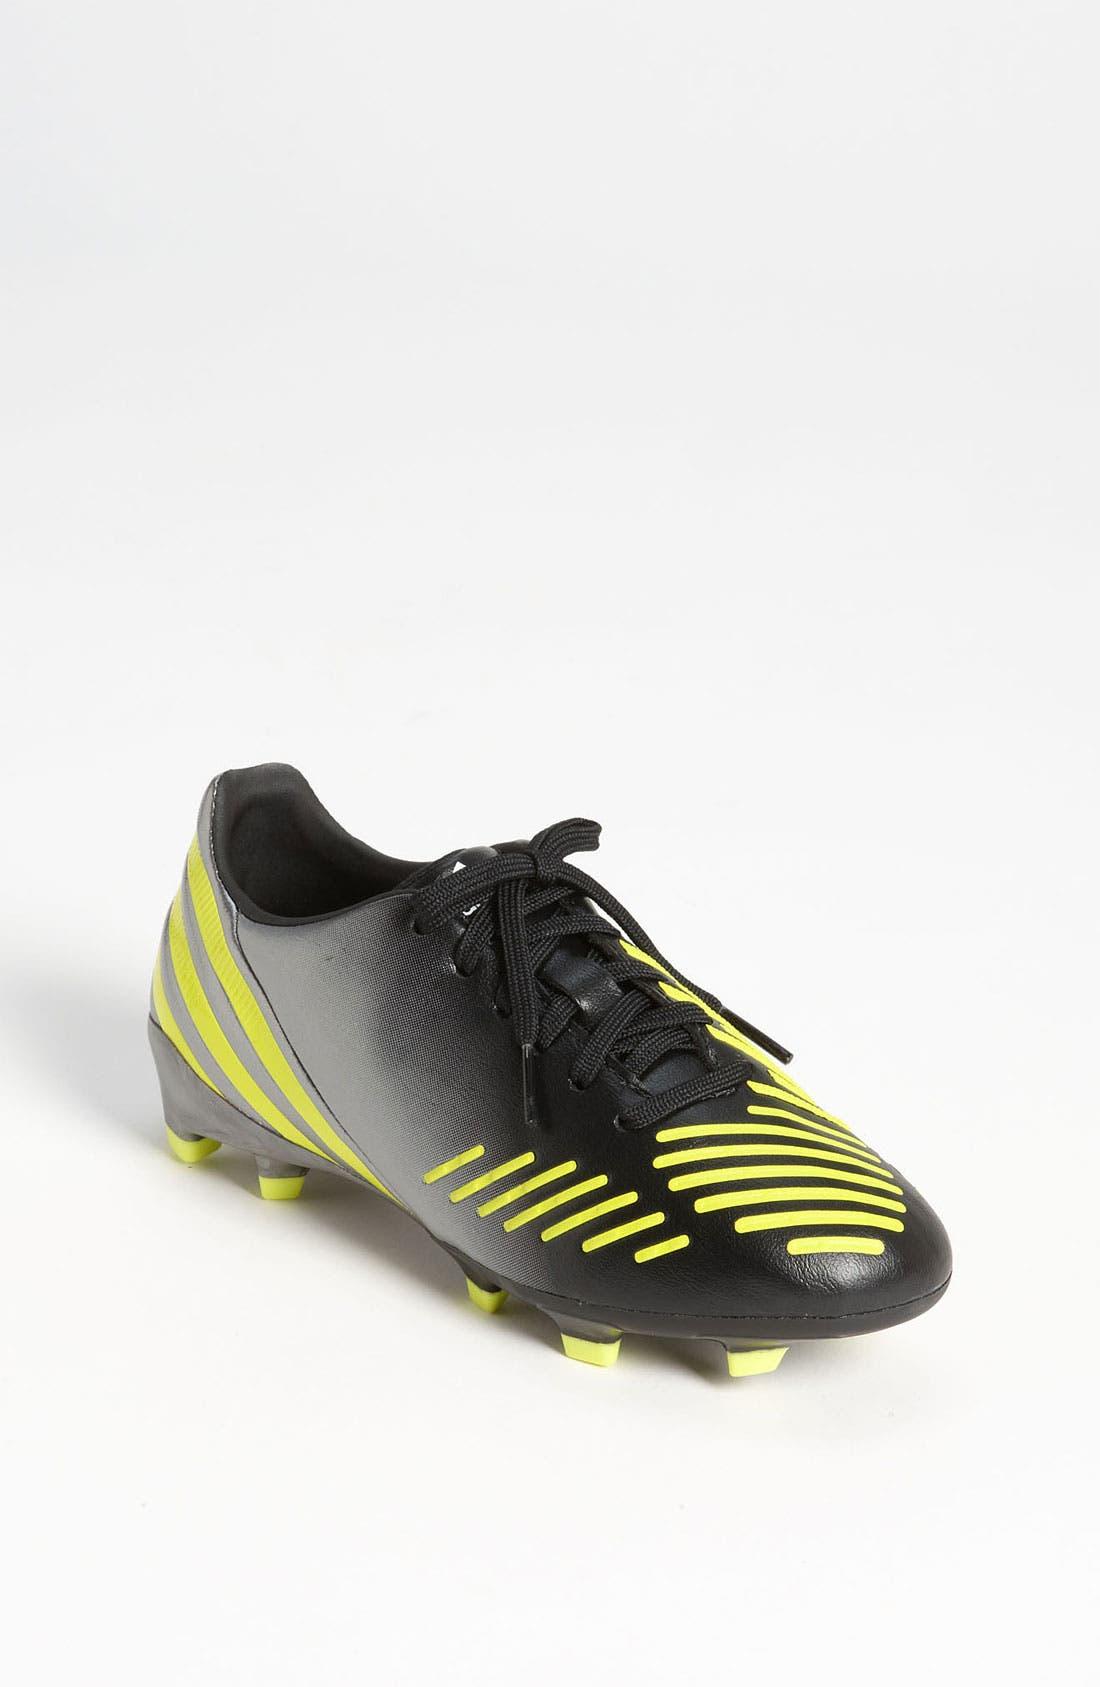 Main Image - adidas 'Predator Absolado LZ TRX FG' Soccer Shoe (Toddler, Little Kid & Big Kid)